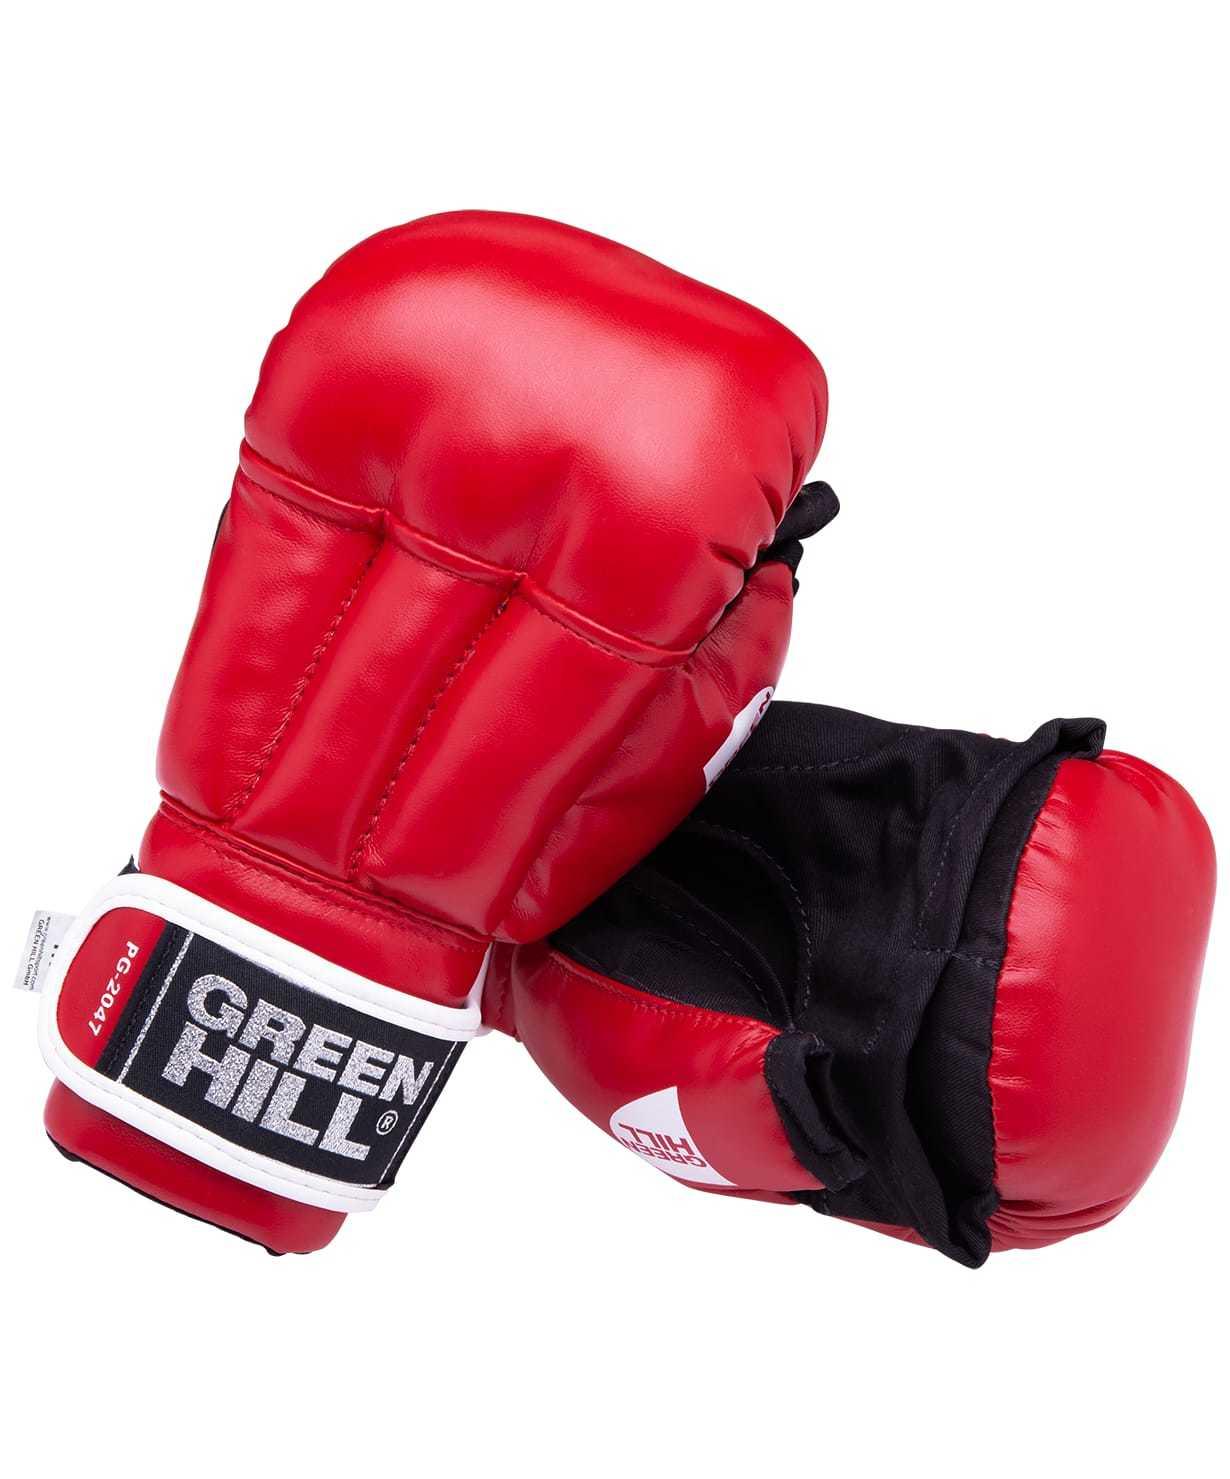 Перчатки Перчатки для рукопашного боя Green Hill 59695131af6effdf40e3c09852f01024.jpg